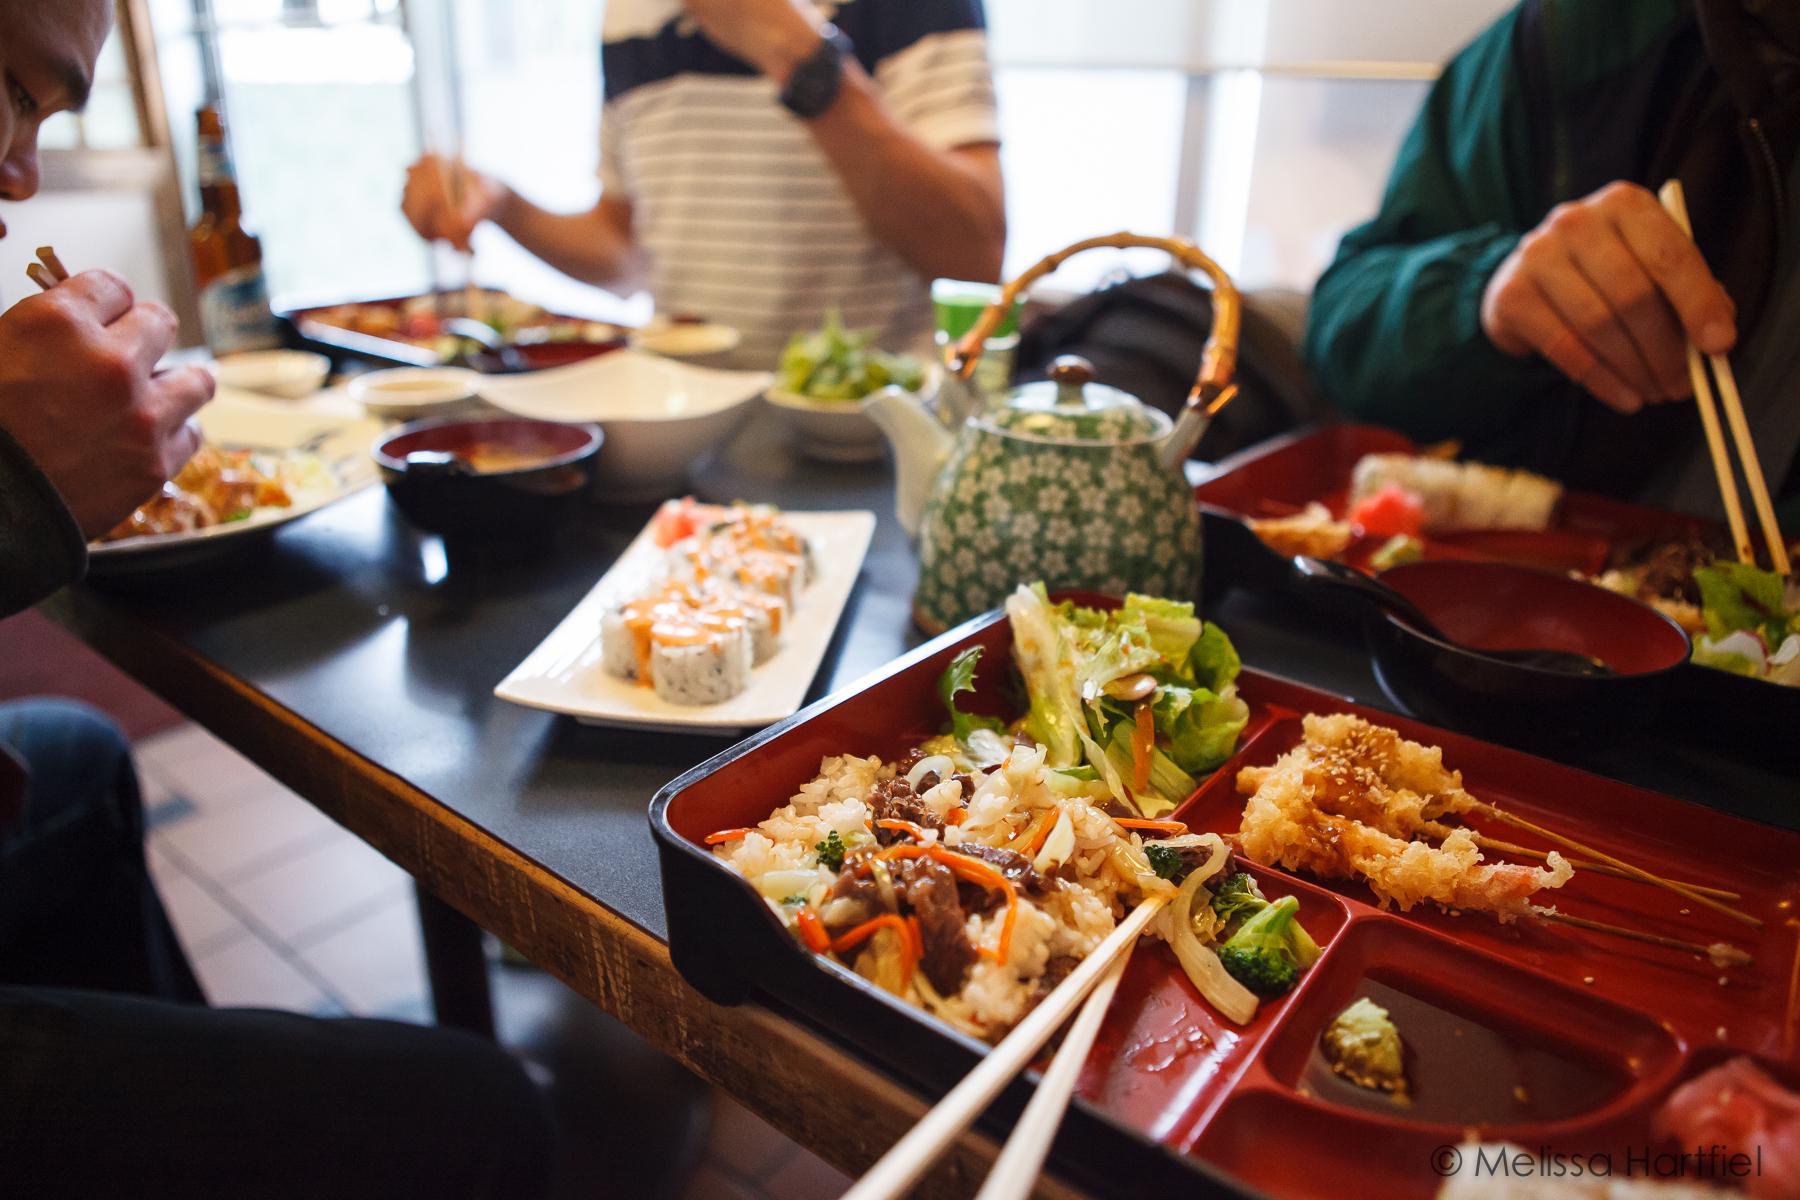 Restaurant Food Photography Part 2